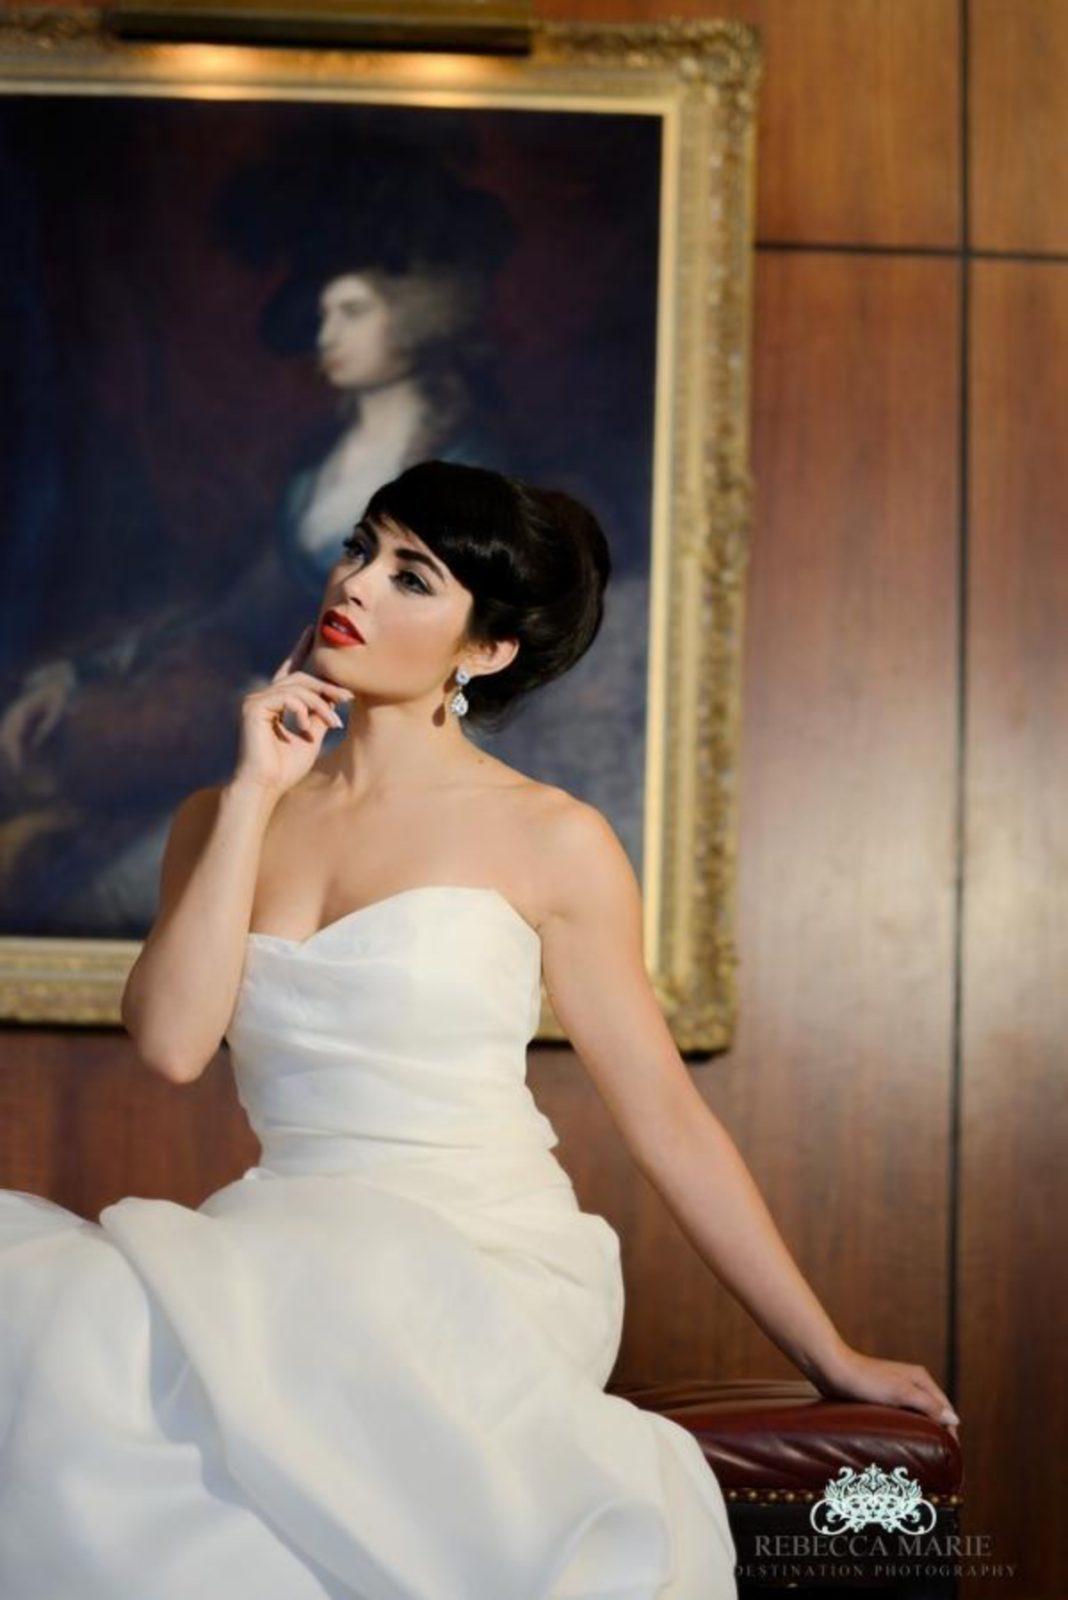 Audrey Hepburn Styled Shoot at The Brown Palace